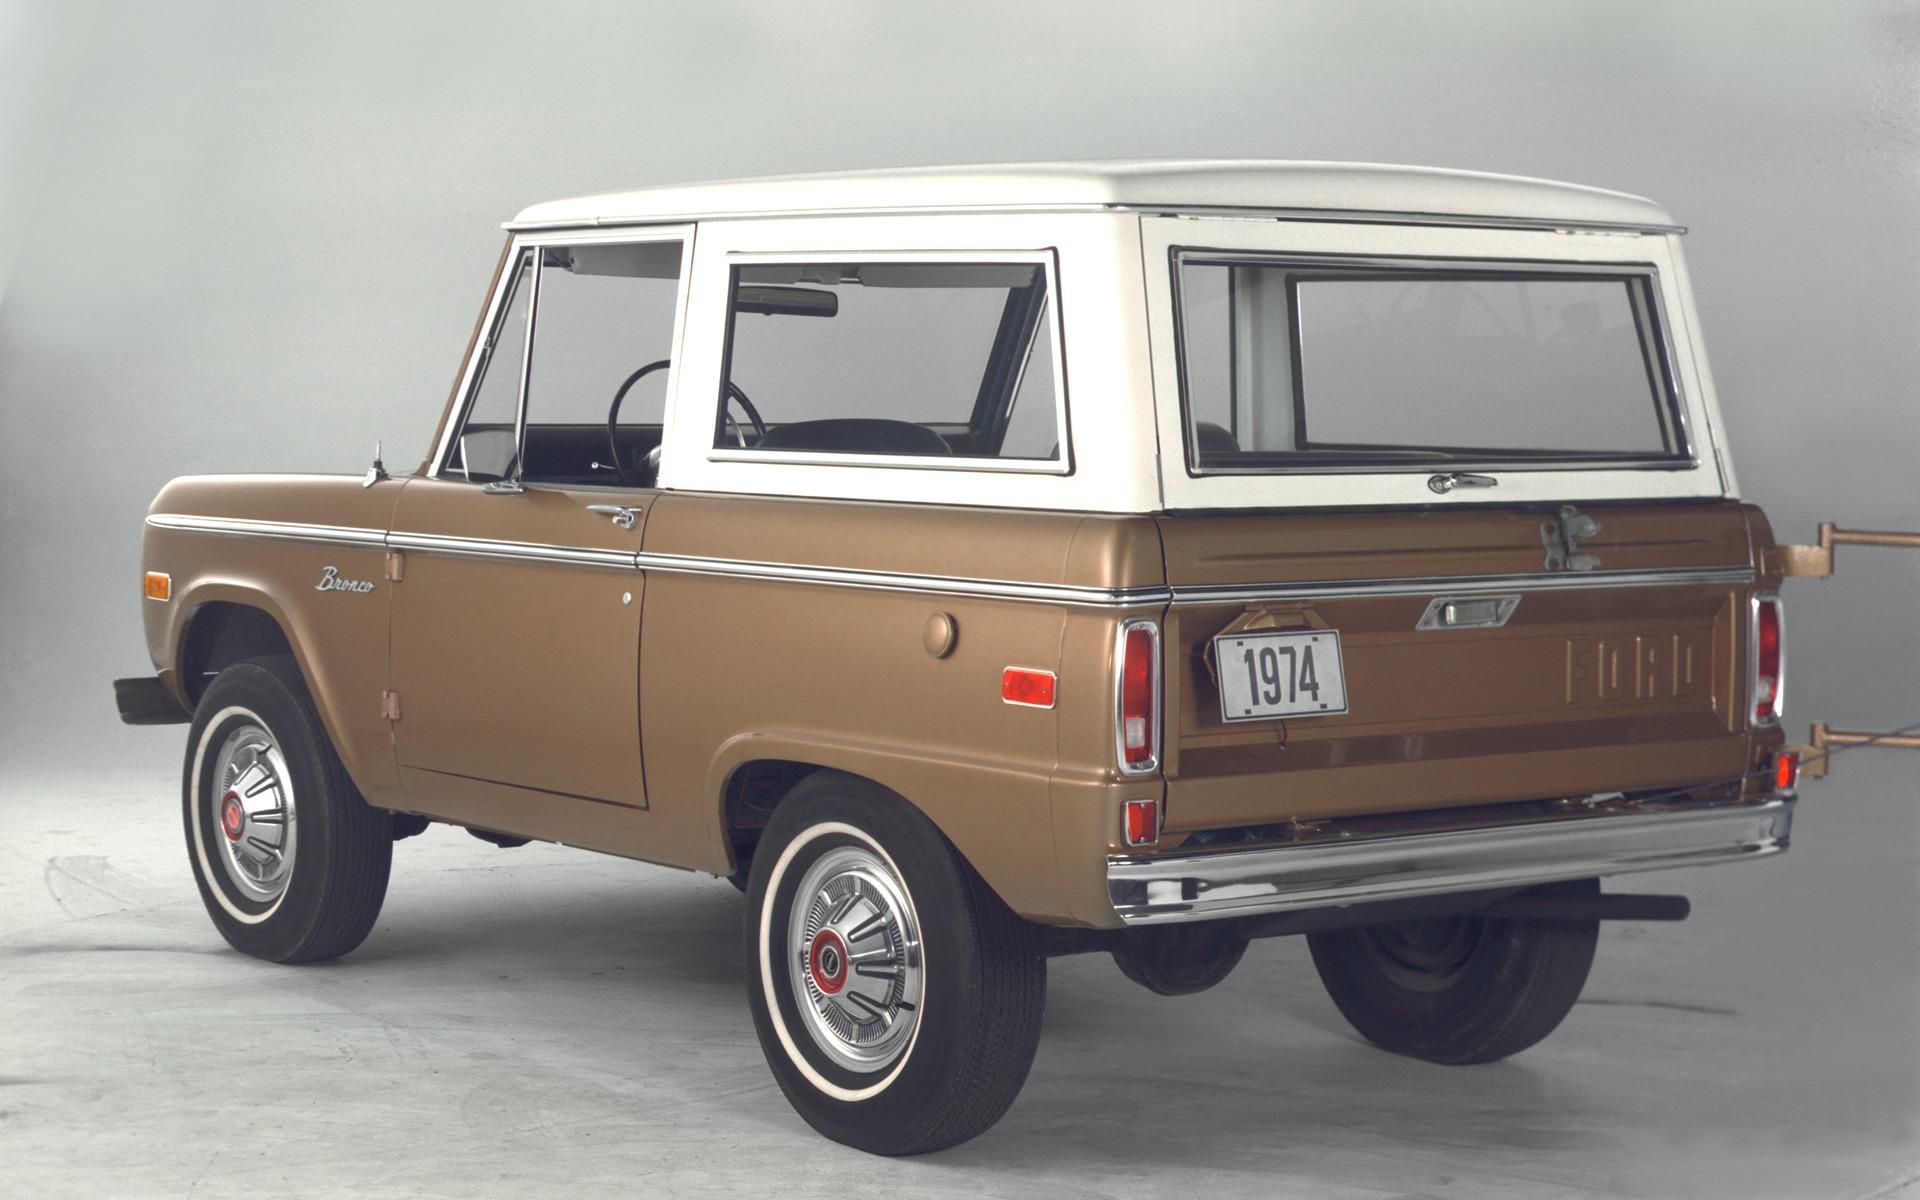 <p>Ford Bronco 1974</p>